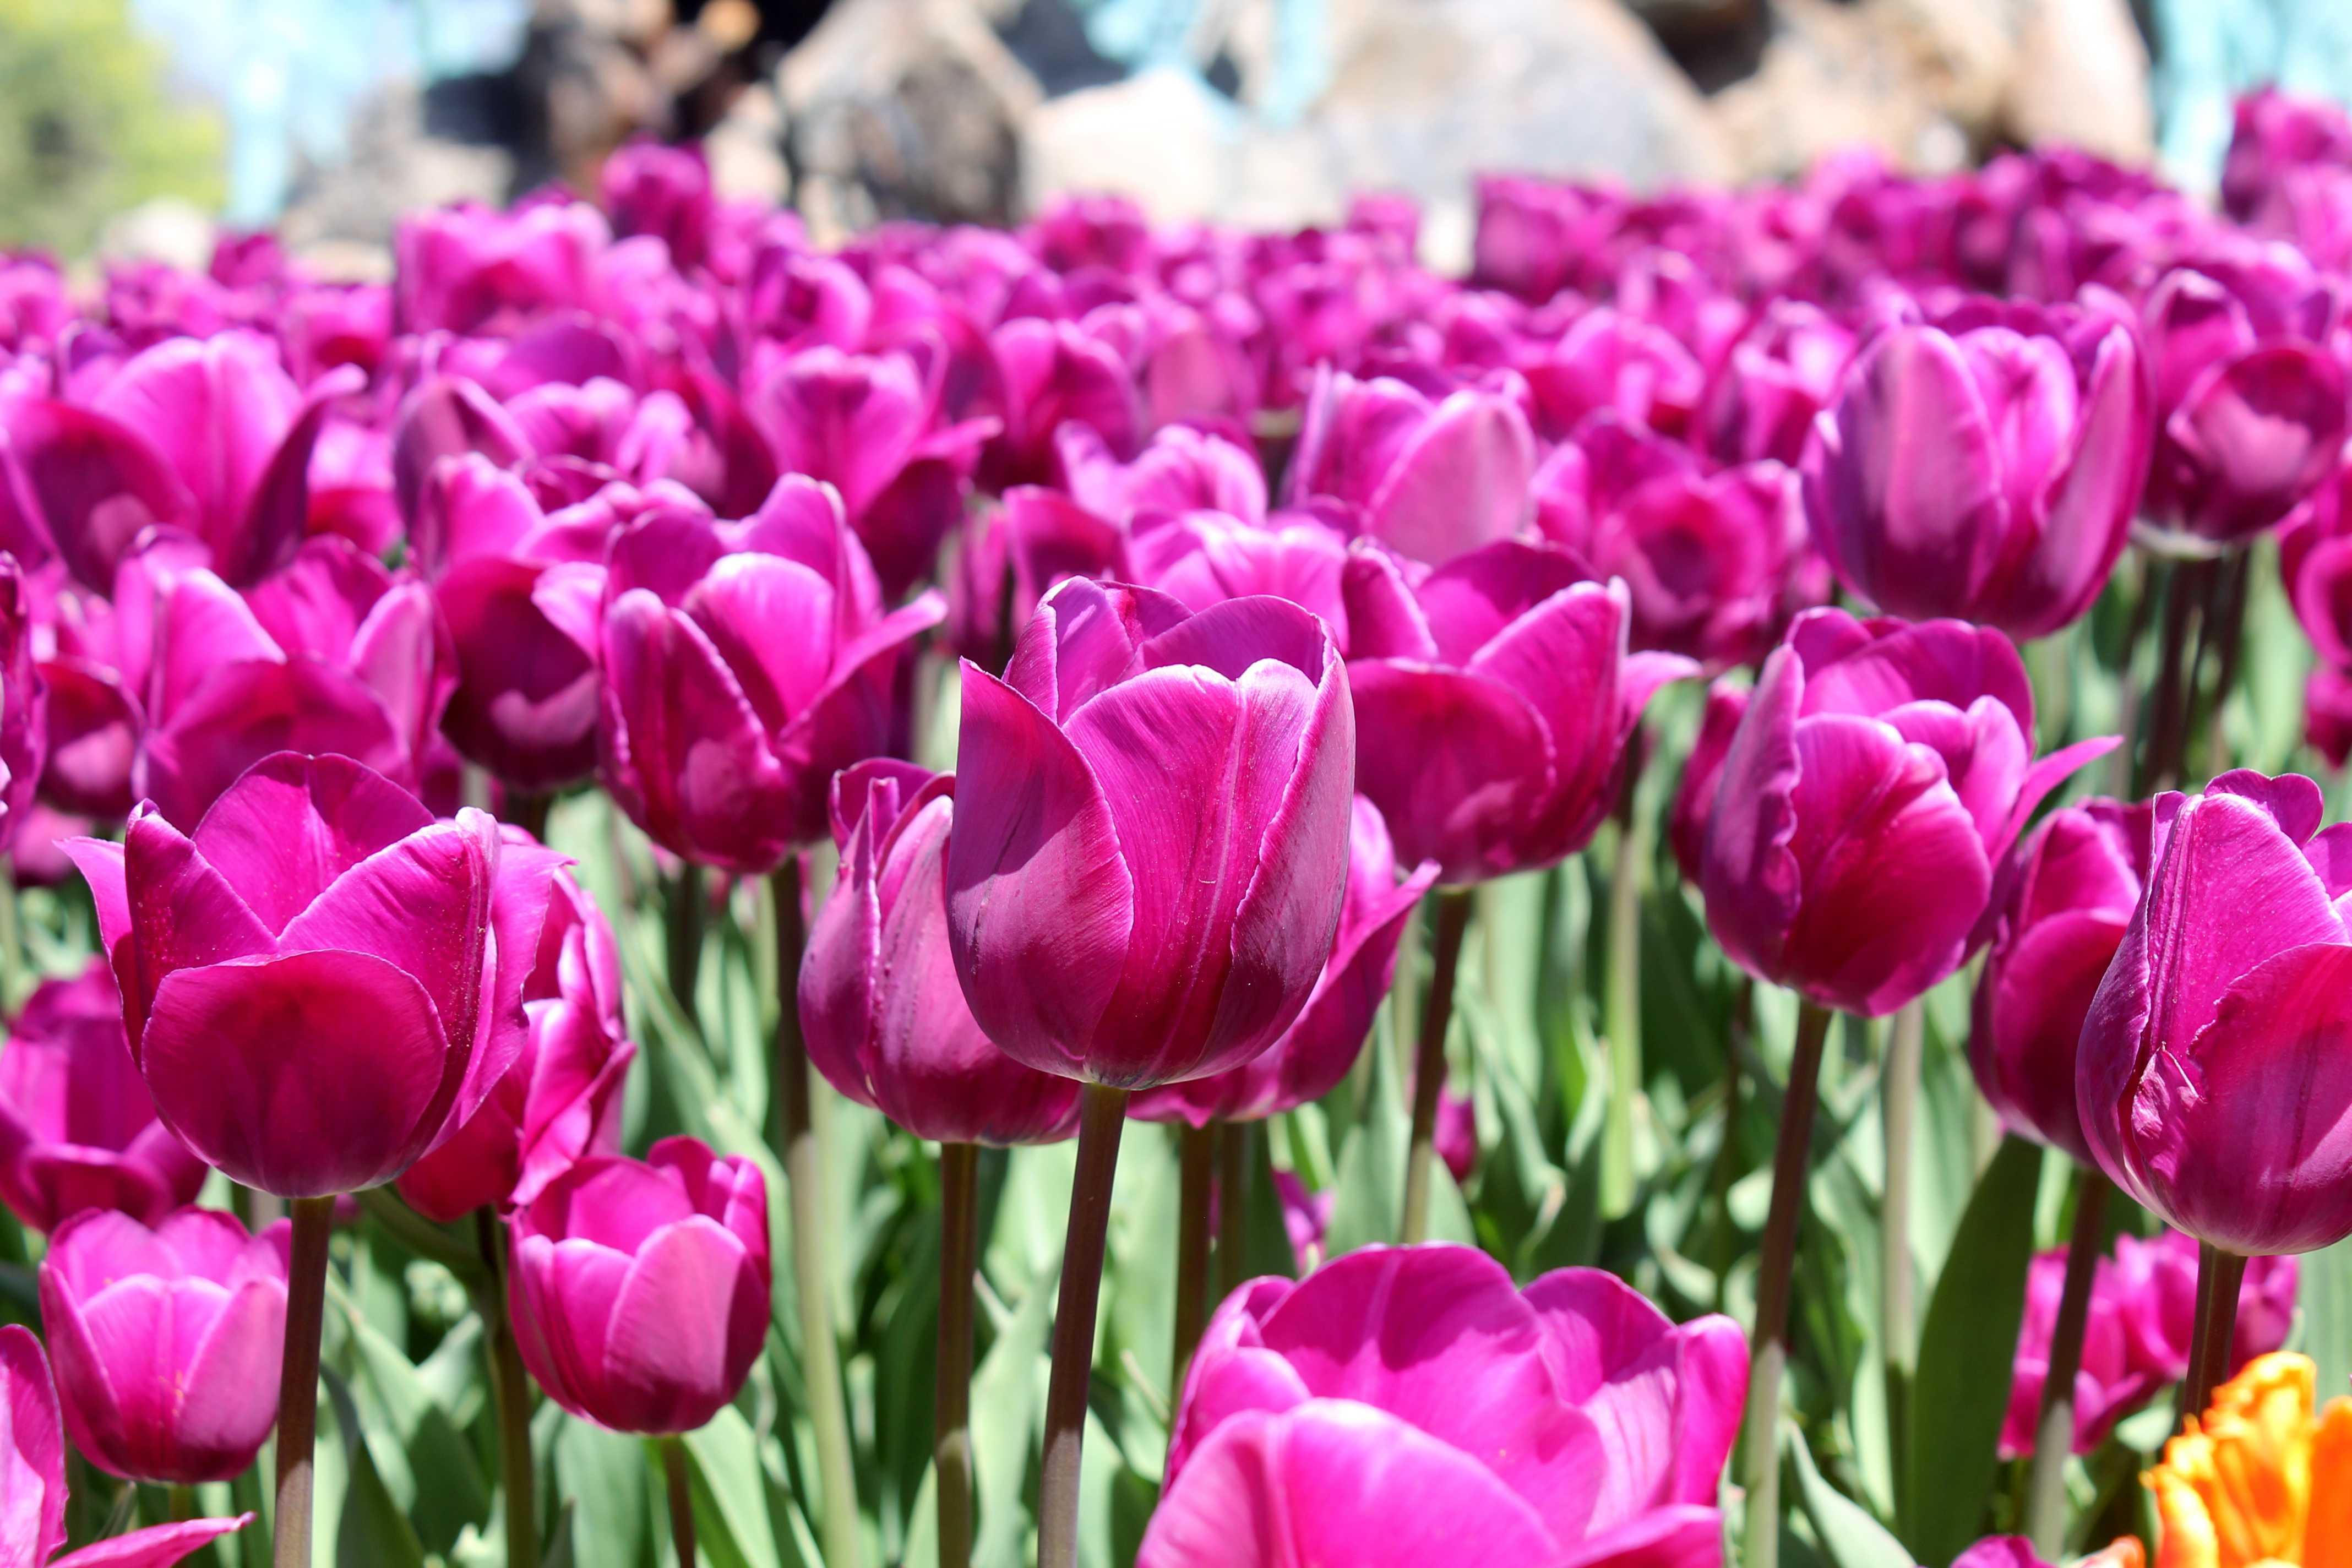 Fuschia Tulips at Albany Tulip Fest